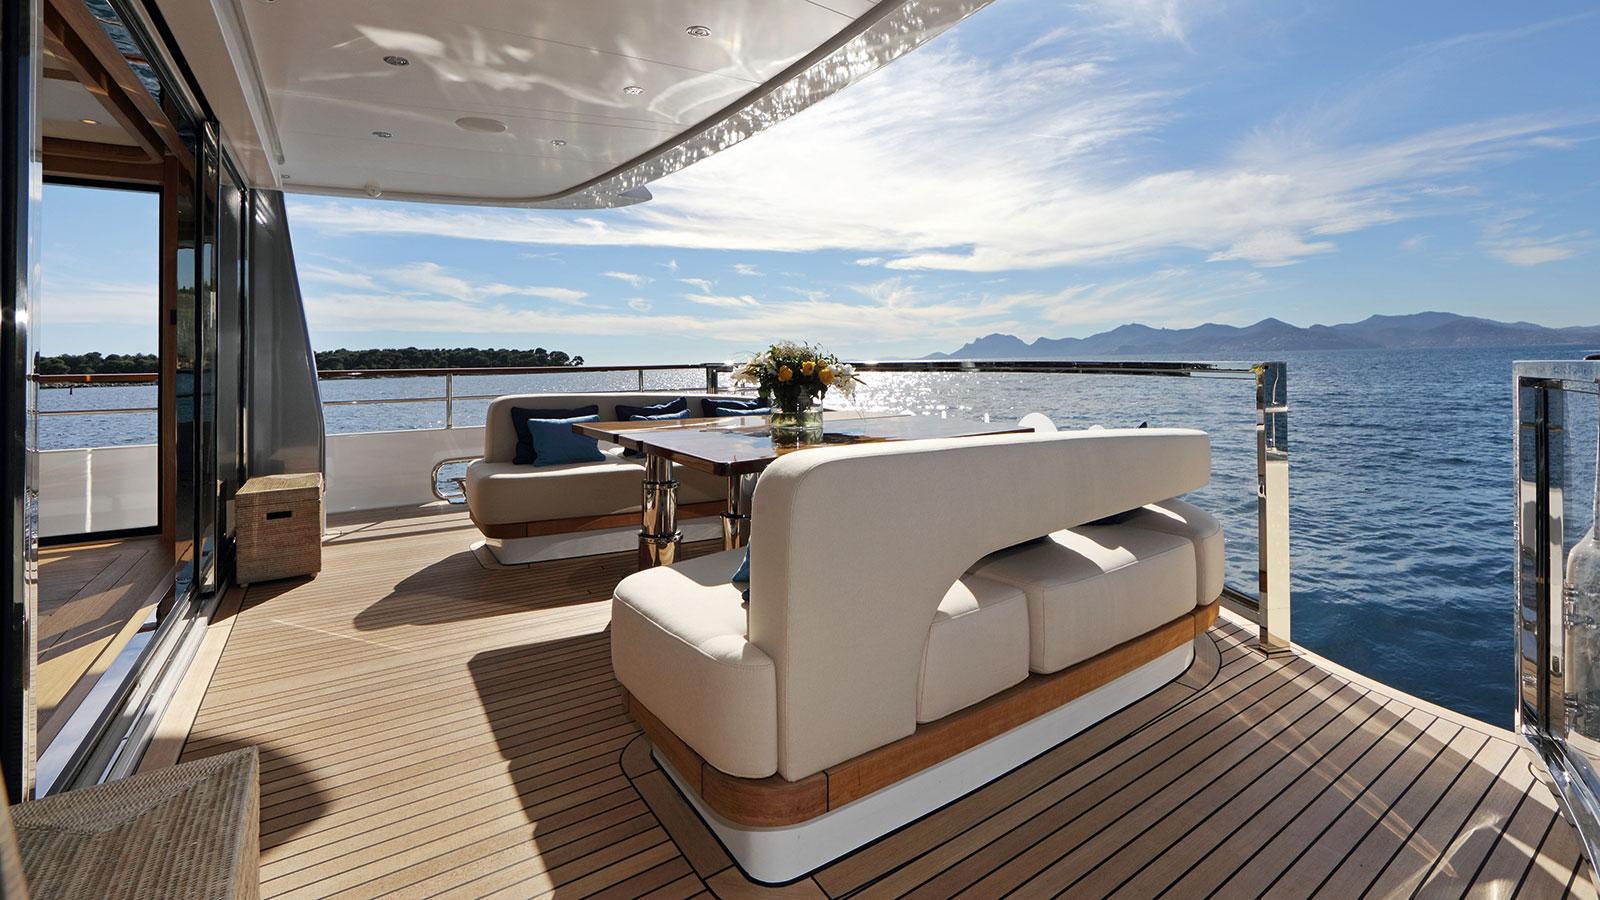 solis-motor-yacht-mulder-2015-34m-aft-deck